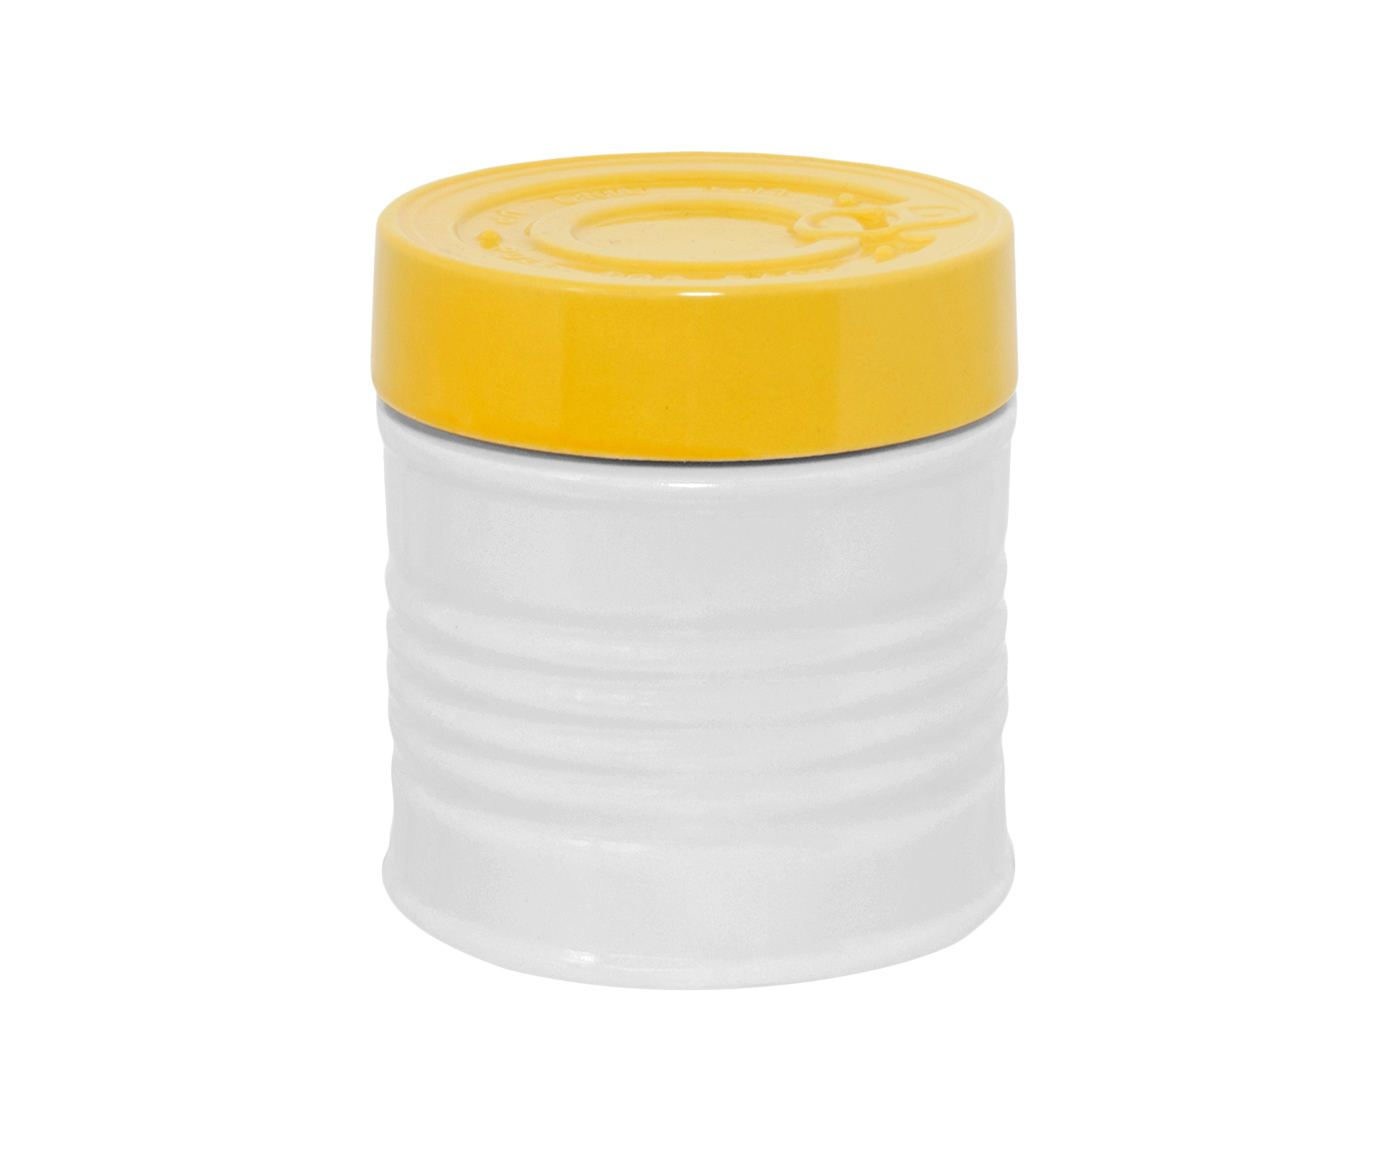 Pote Can Lata Amarelo e Branco - 700ml | Westwing.com.br